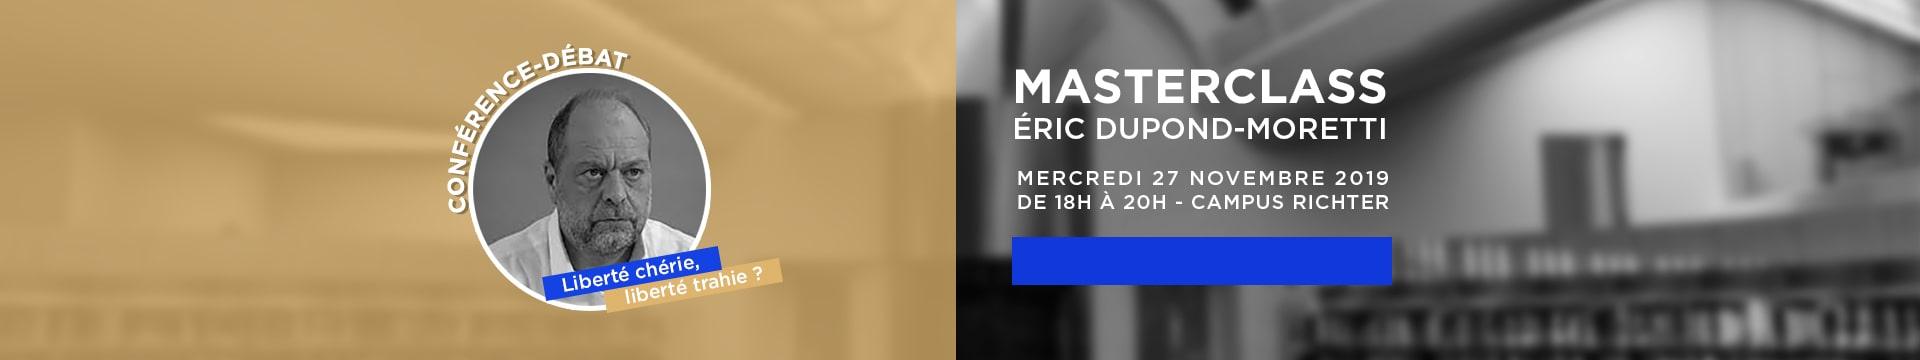 Masterclass Eric Dupond-Moretti La Tribune - Montpellier Management